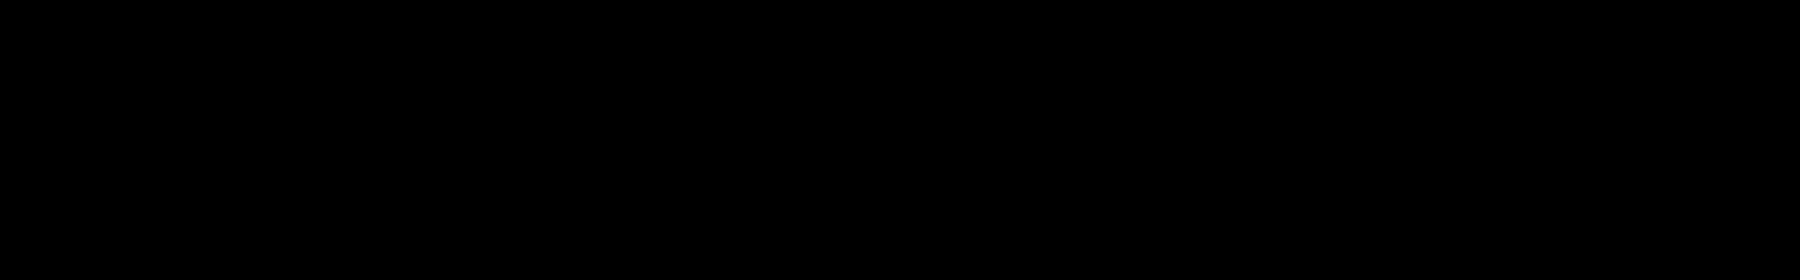 White audio waveform